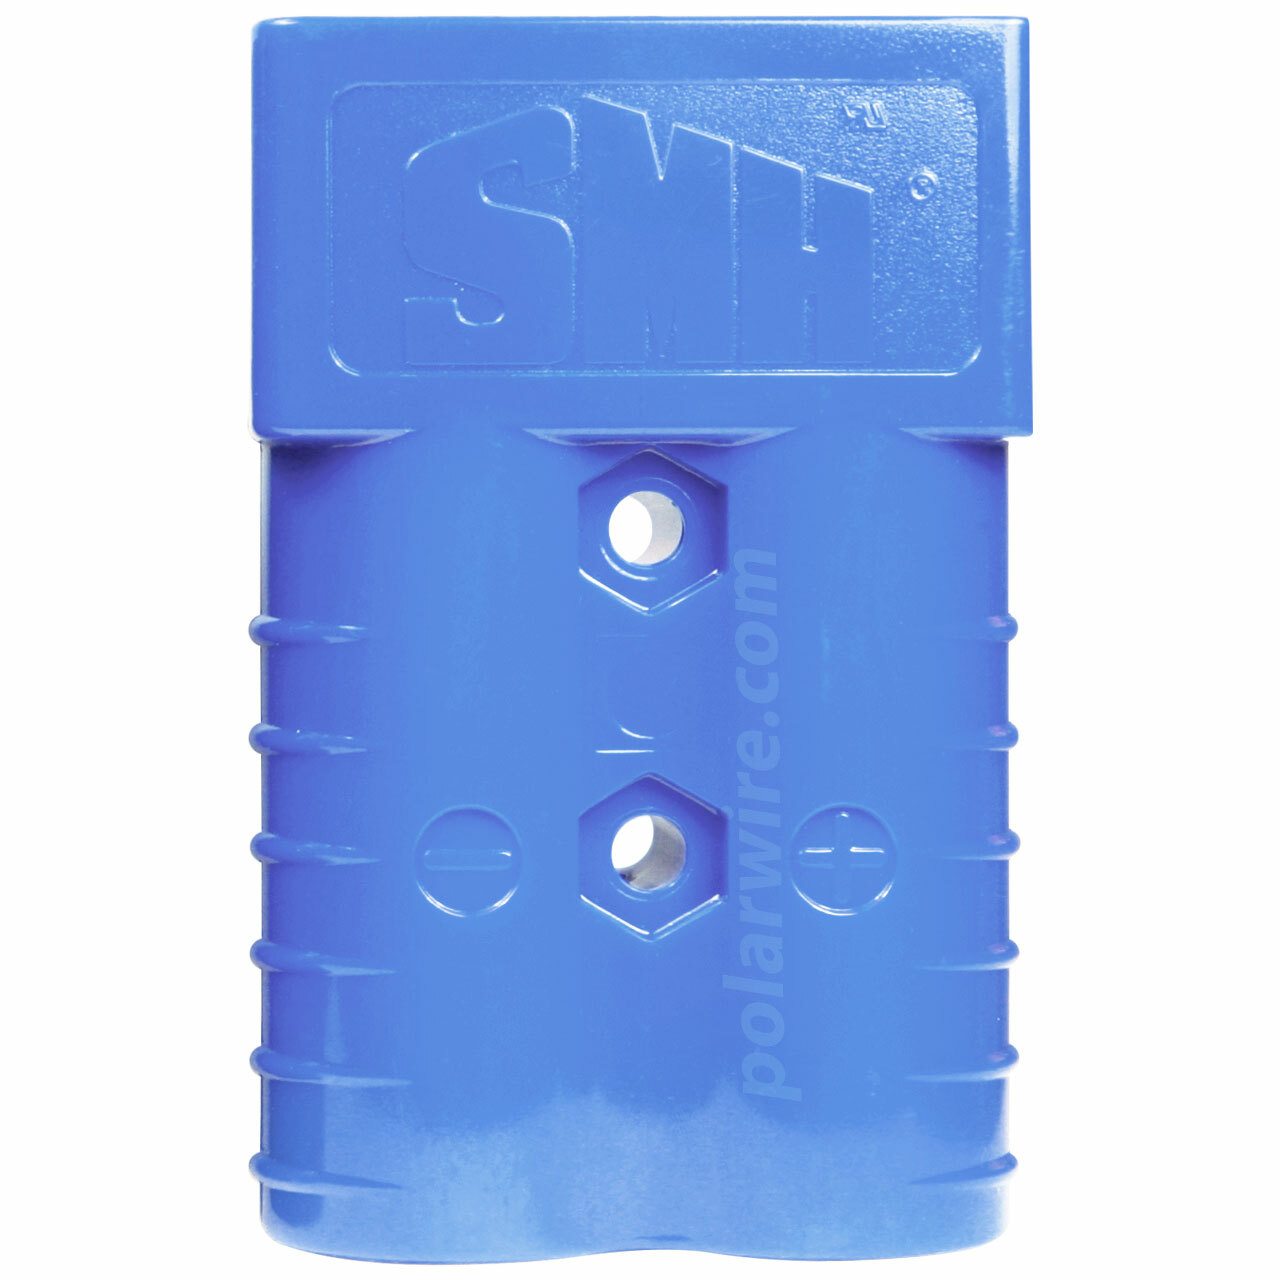 350AMP HOUSING TWIN BLUE